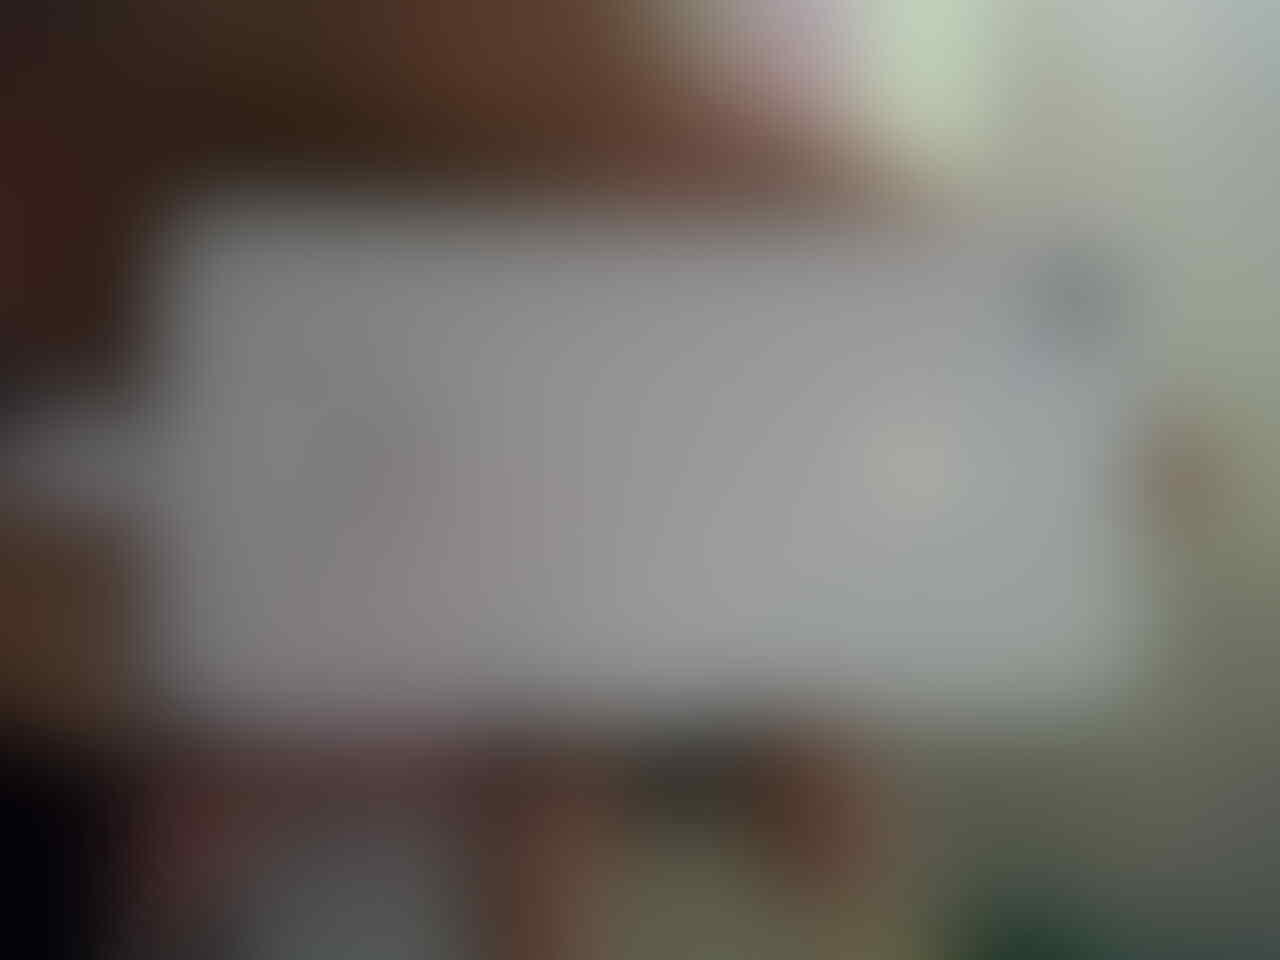 dijual iphone 4 32GB CDMA white surabaya